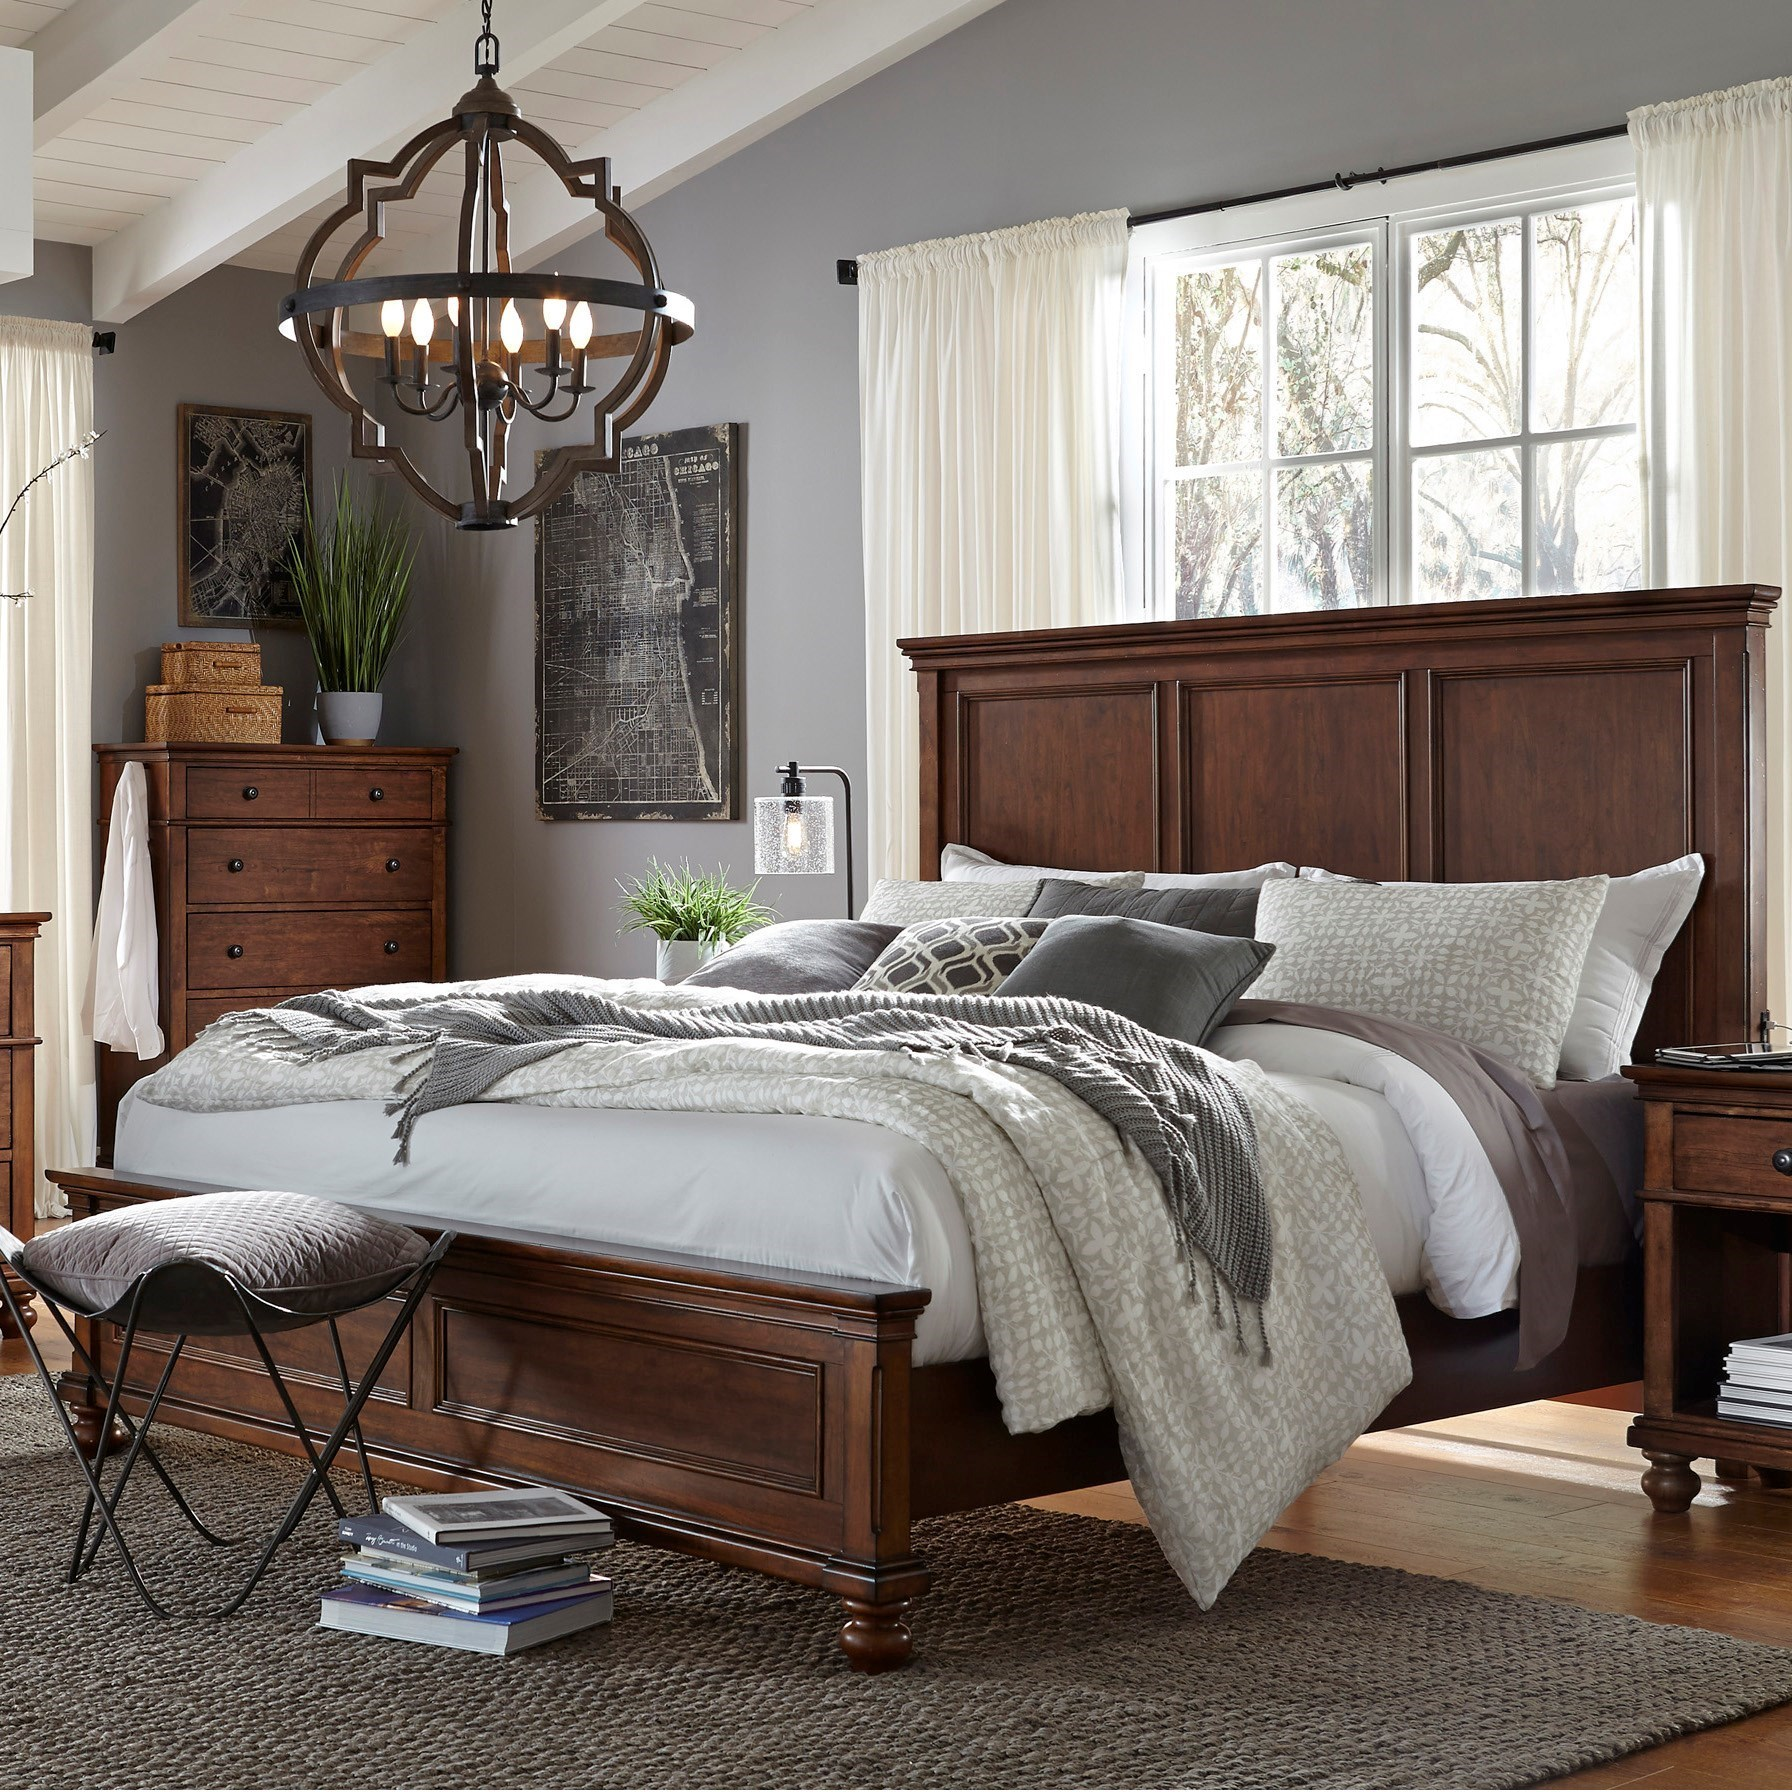 Aspenhome Oxford Queen Bed - Item Number: I07-412+403+402-WBR